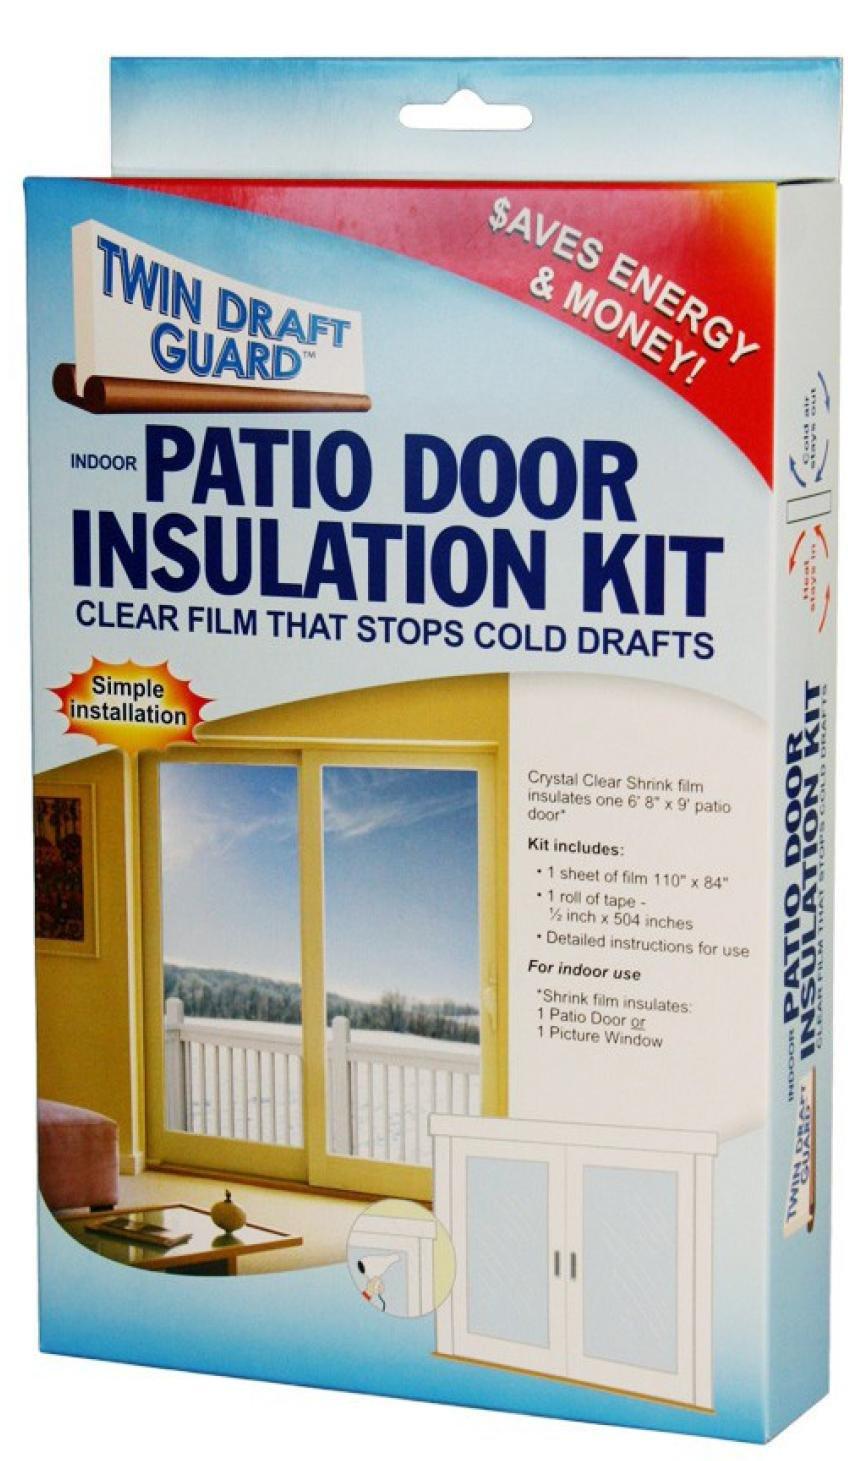 Twin Draft Guard Patio Door Insulation Kit - Weatherproofing Window Insulation Kits - Amazon.com & Twin Draft Guard Patio Door Insulation Kit - Weatherproofing ... pezcame.com